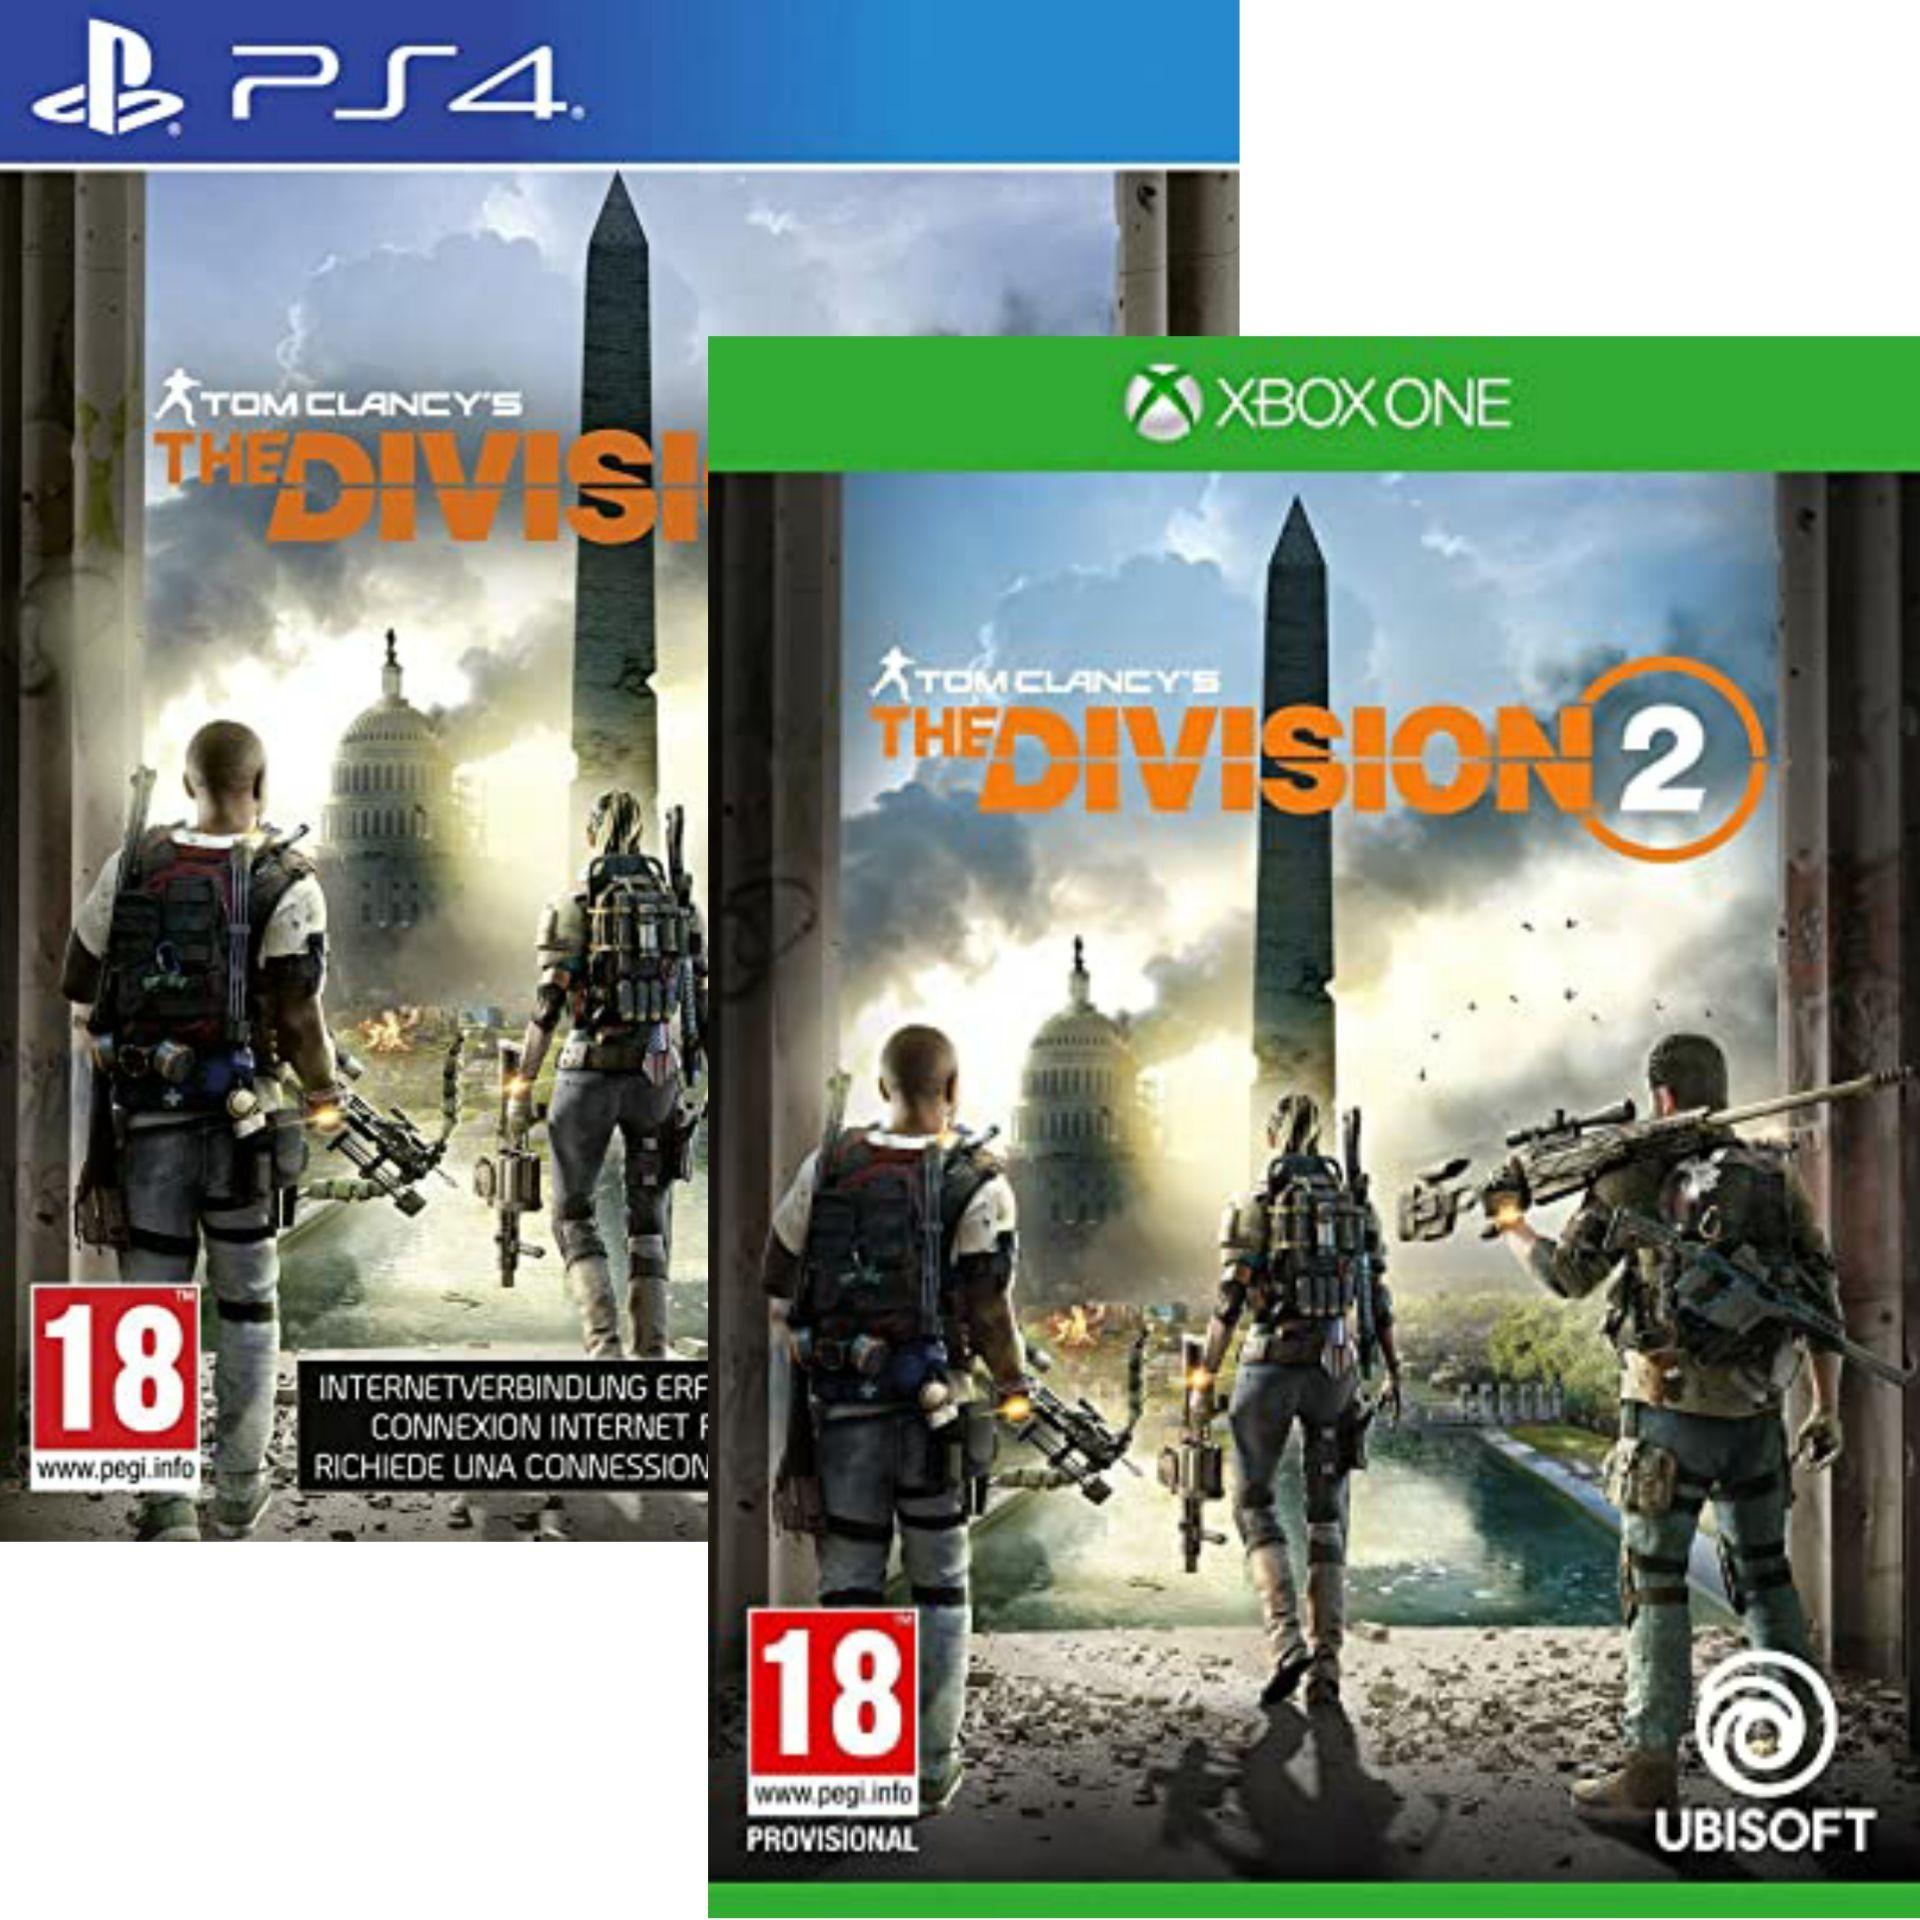 The Division 2 sur PS4 ou Xbox One